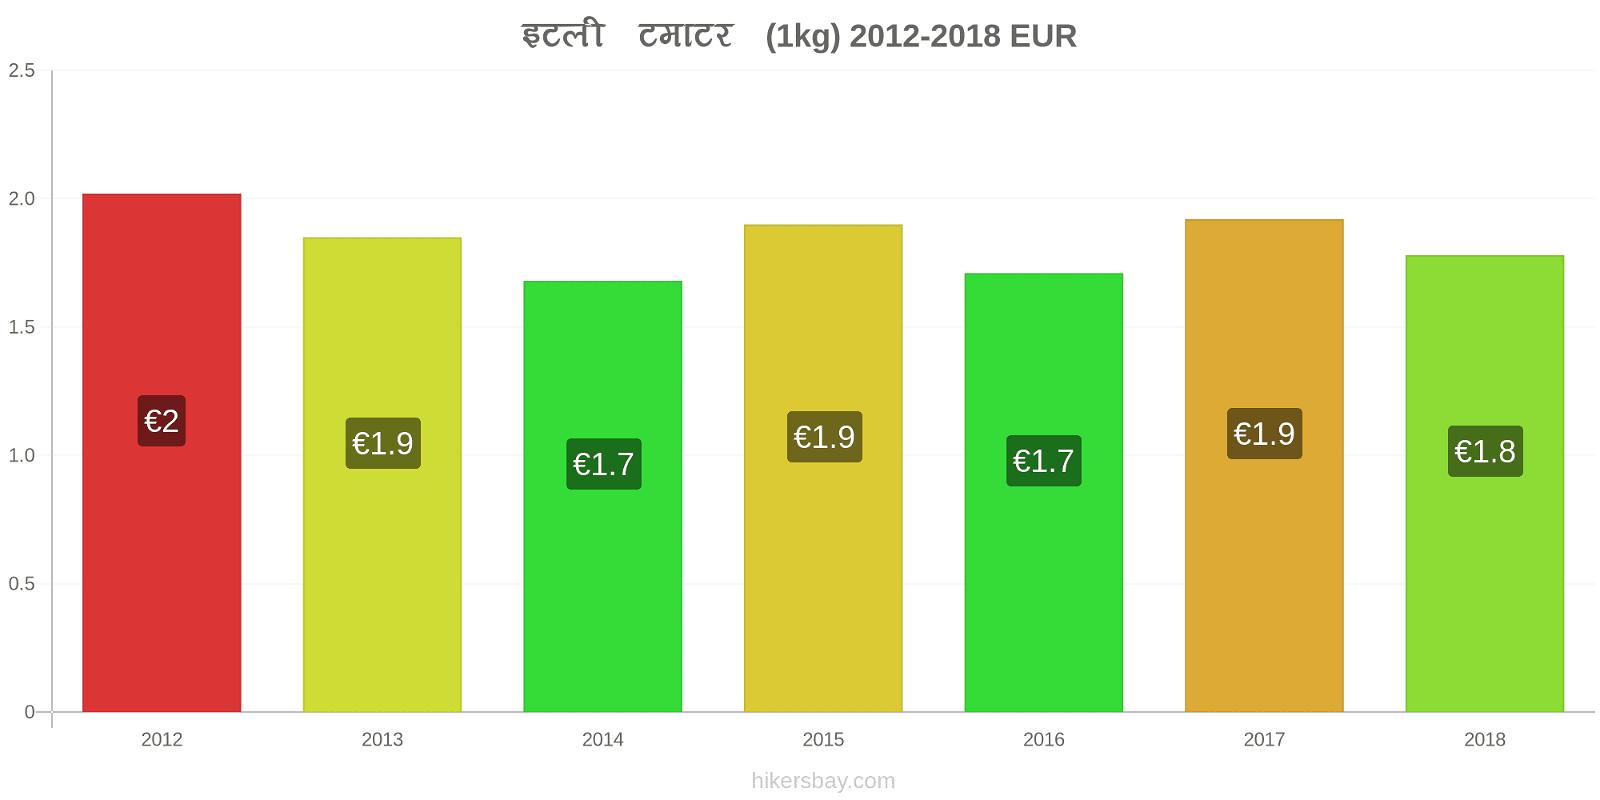 इटली मूल्य परिवर्तन टमाटर (1kg) hikersbay.com